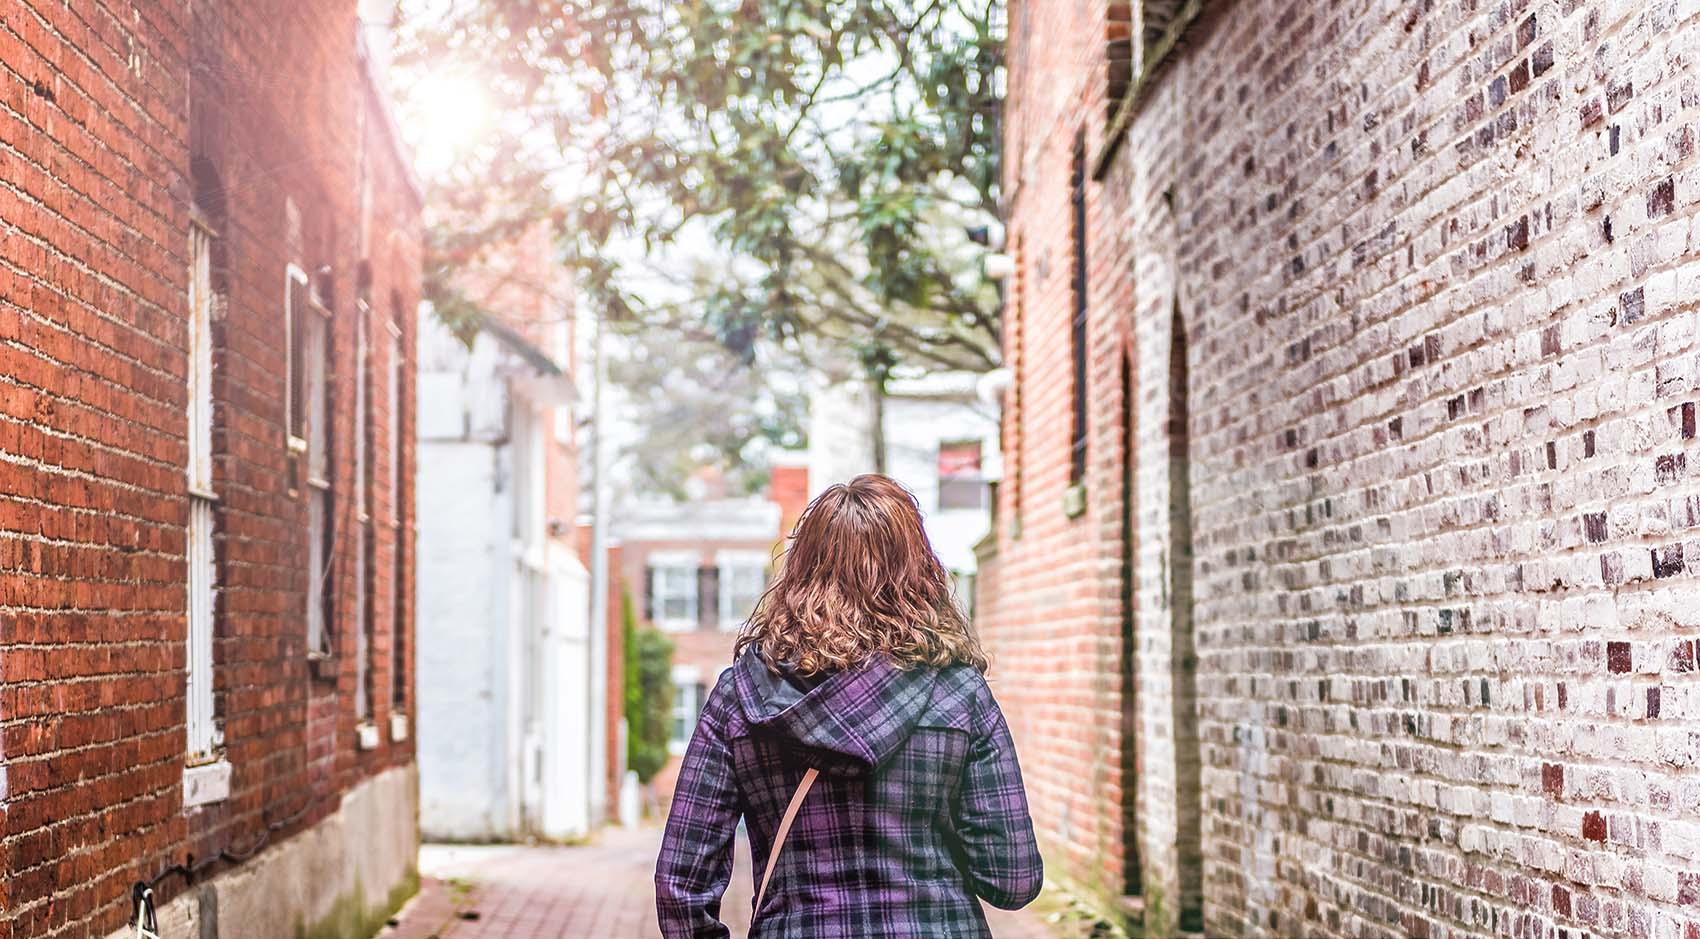 Woman walking through brick alley way